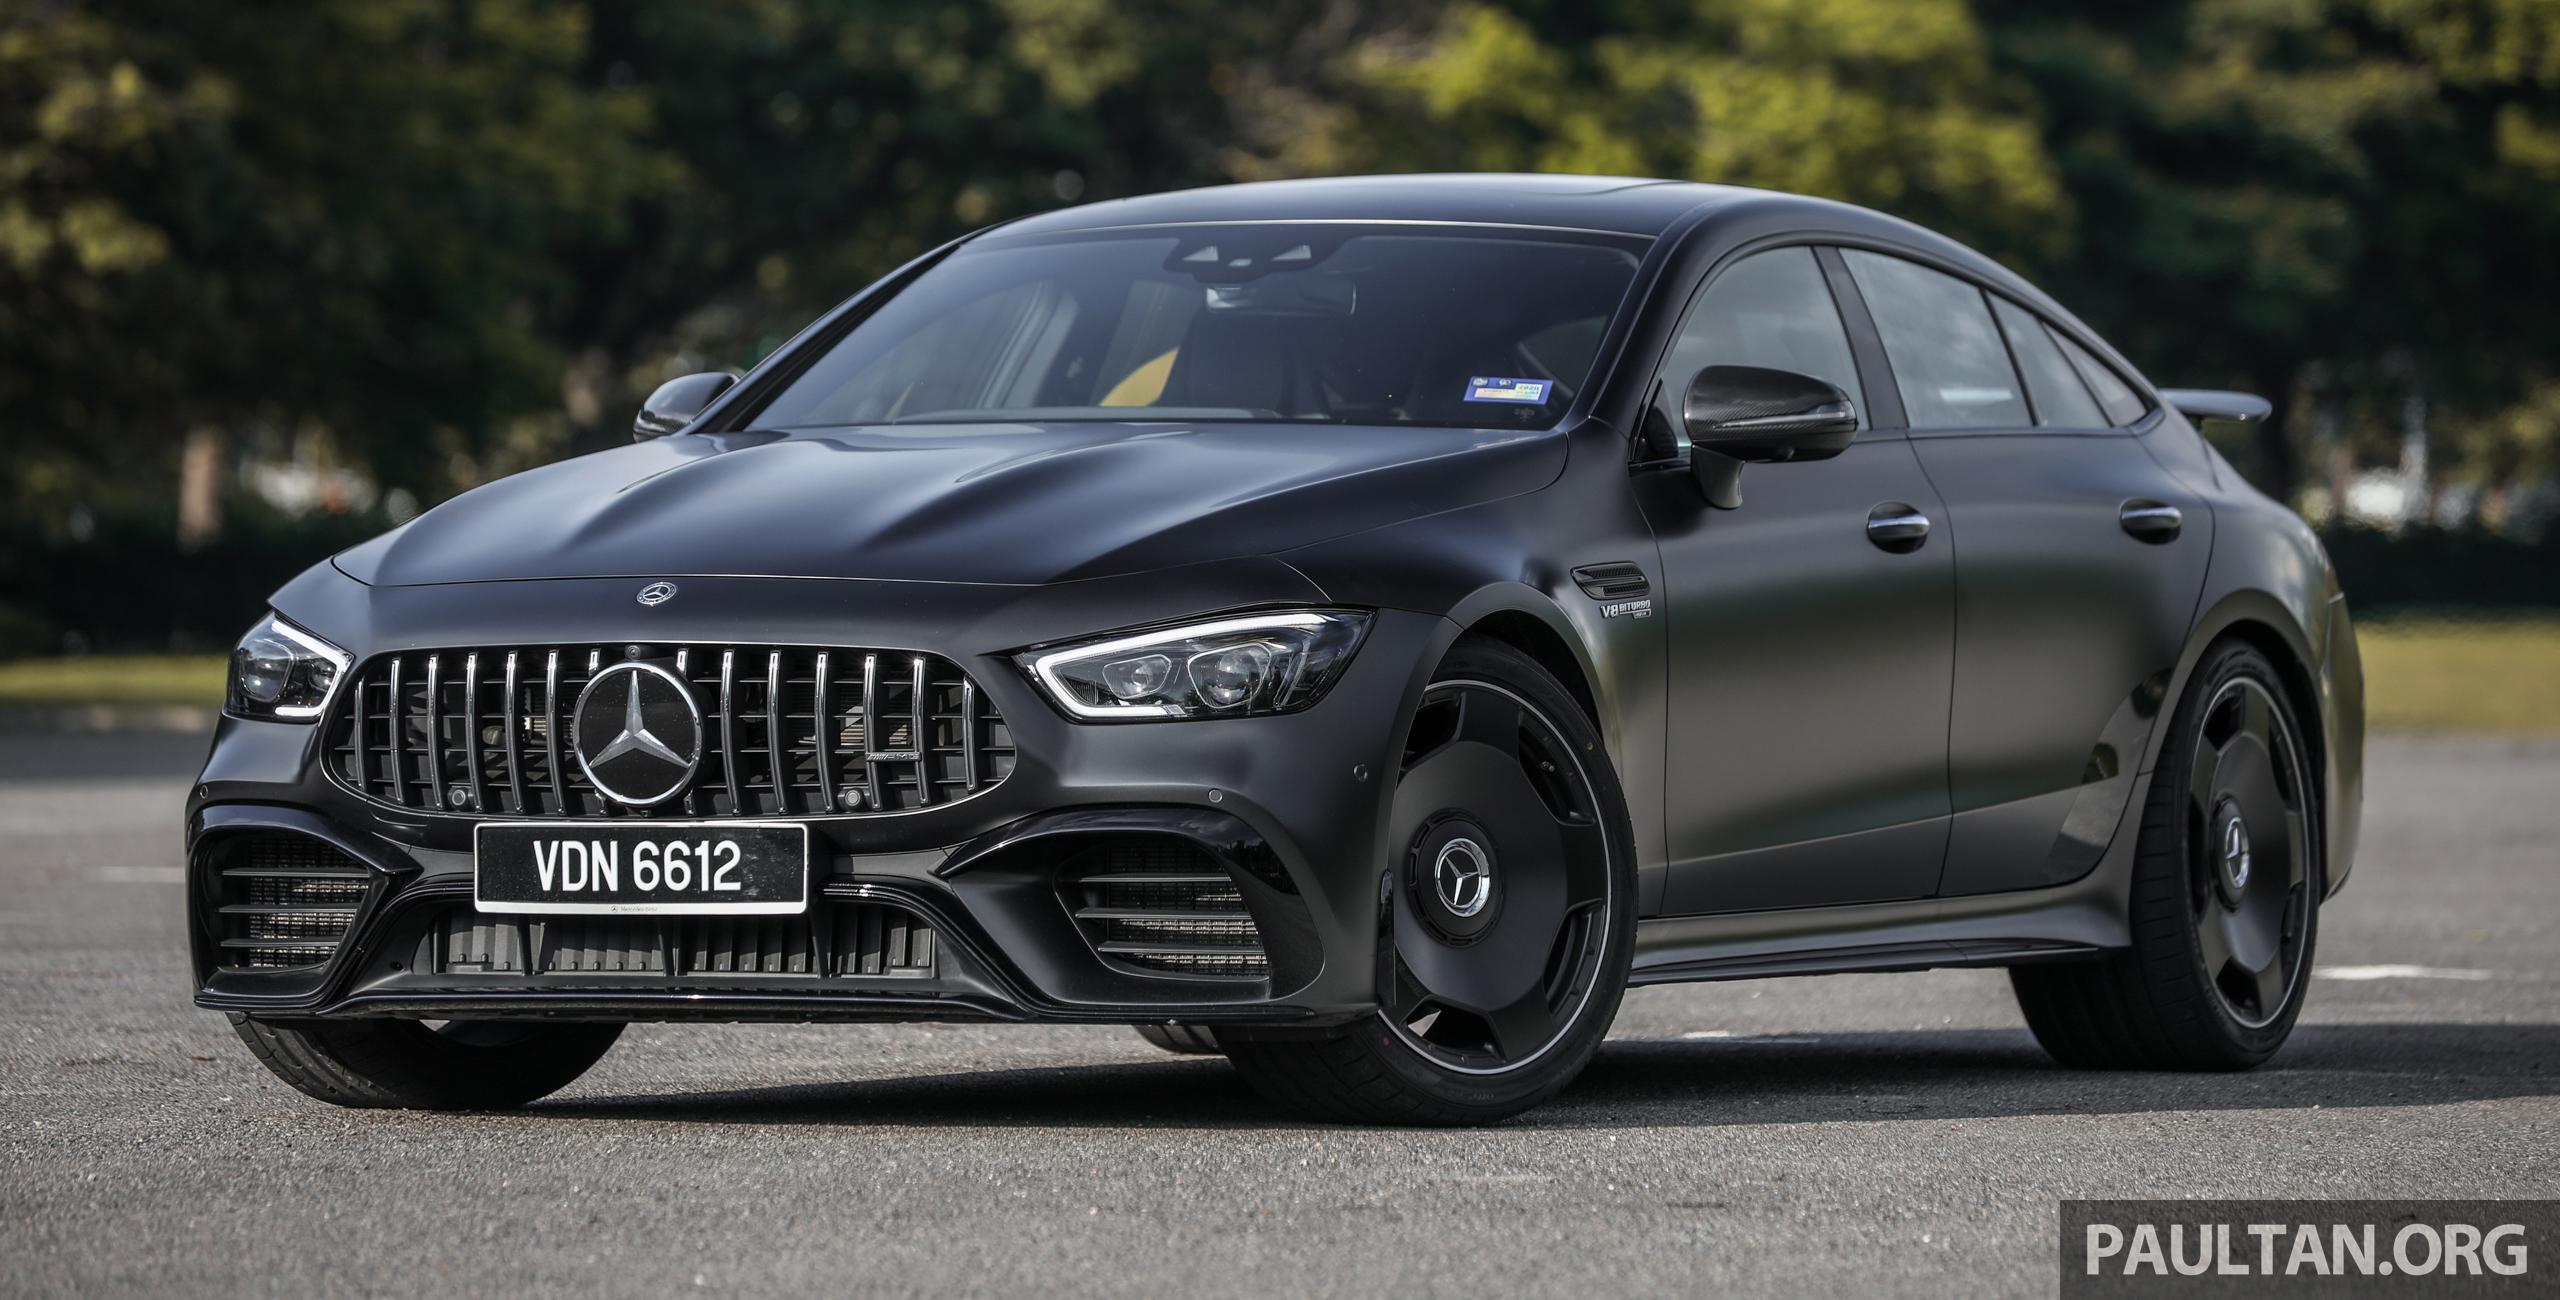 Mercedes Beats Audi Bmw To Be Top Luxe Brand Again Paultan Org